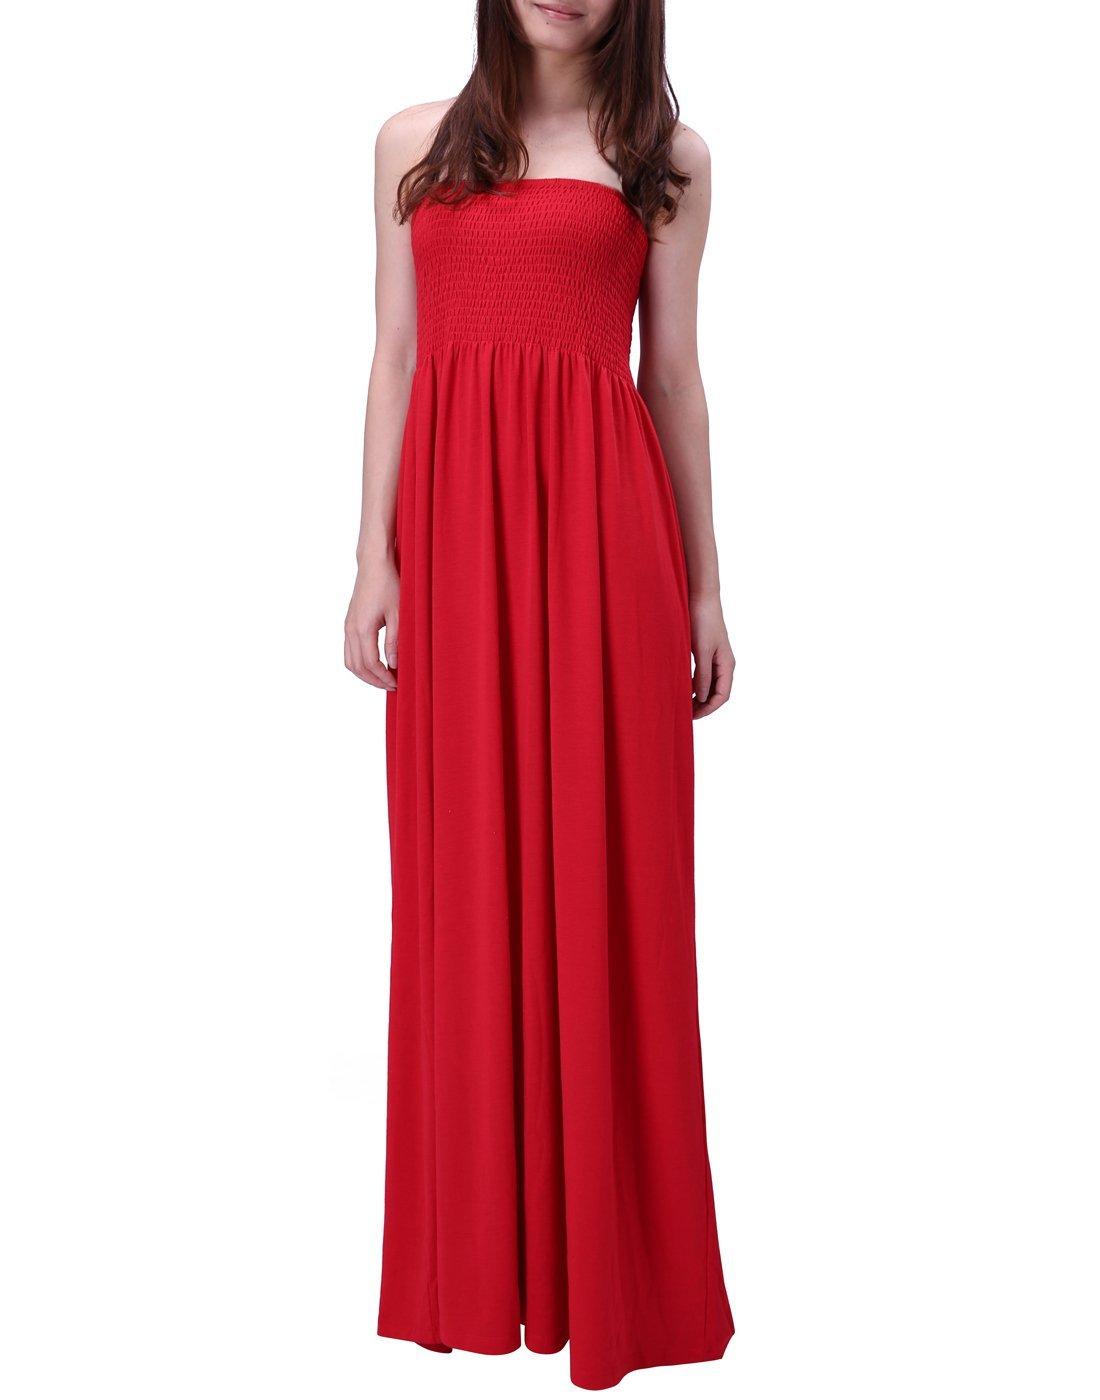 HDE Women's Strapless Maxi Dress Plus Size Tube Top Long Skirt Sundress Cover up (Red, 2X)